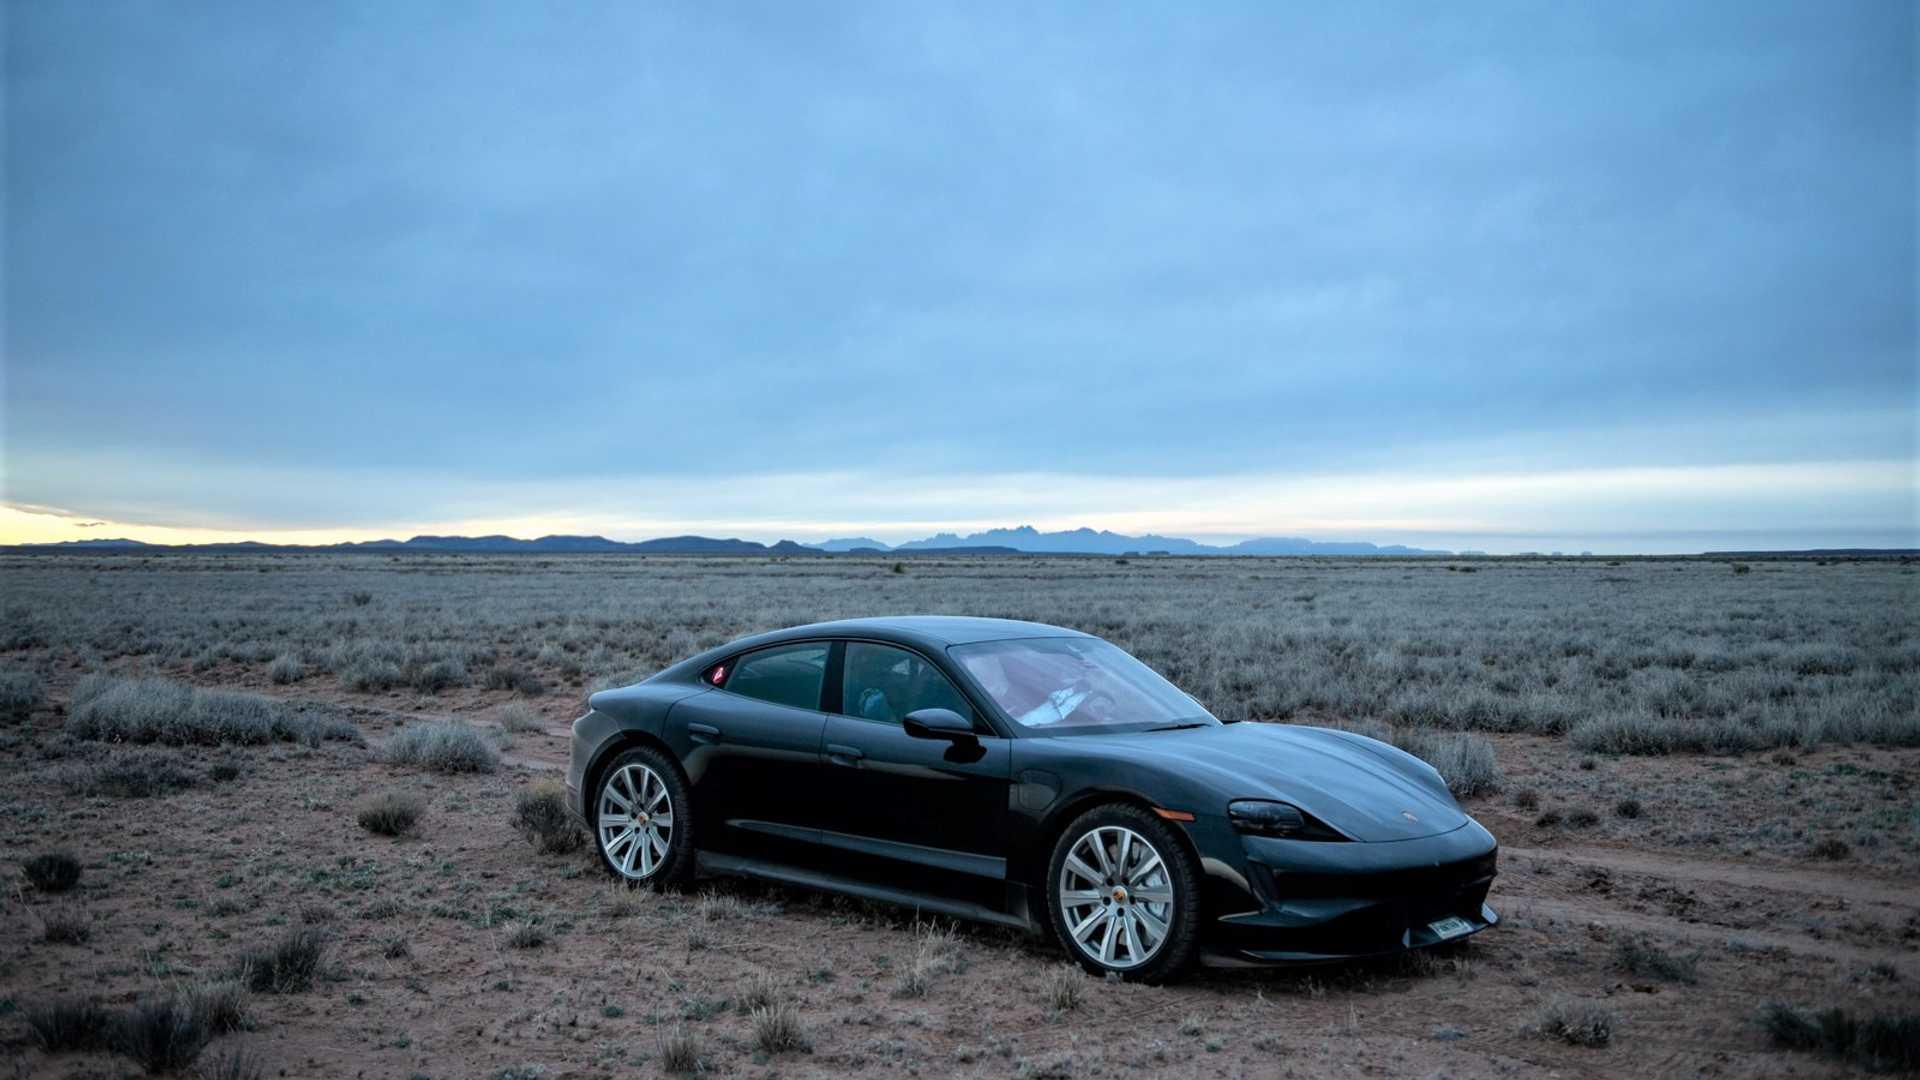 Road_trip_Porsche_Taycan_Turbo_0008